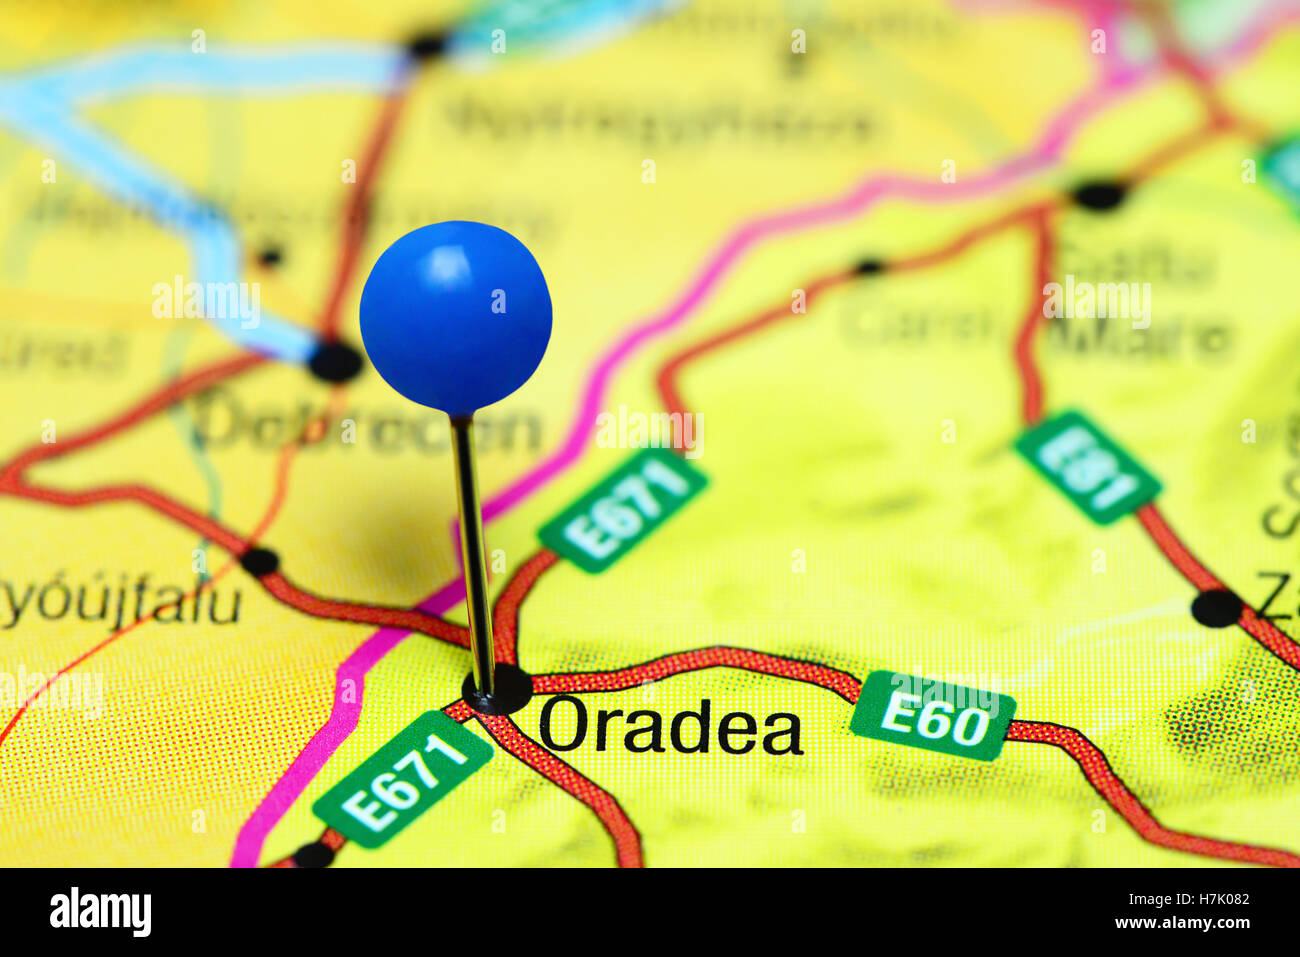 Oradea pinned on a map of Romania Stock Photo Royalty Free Image